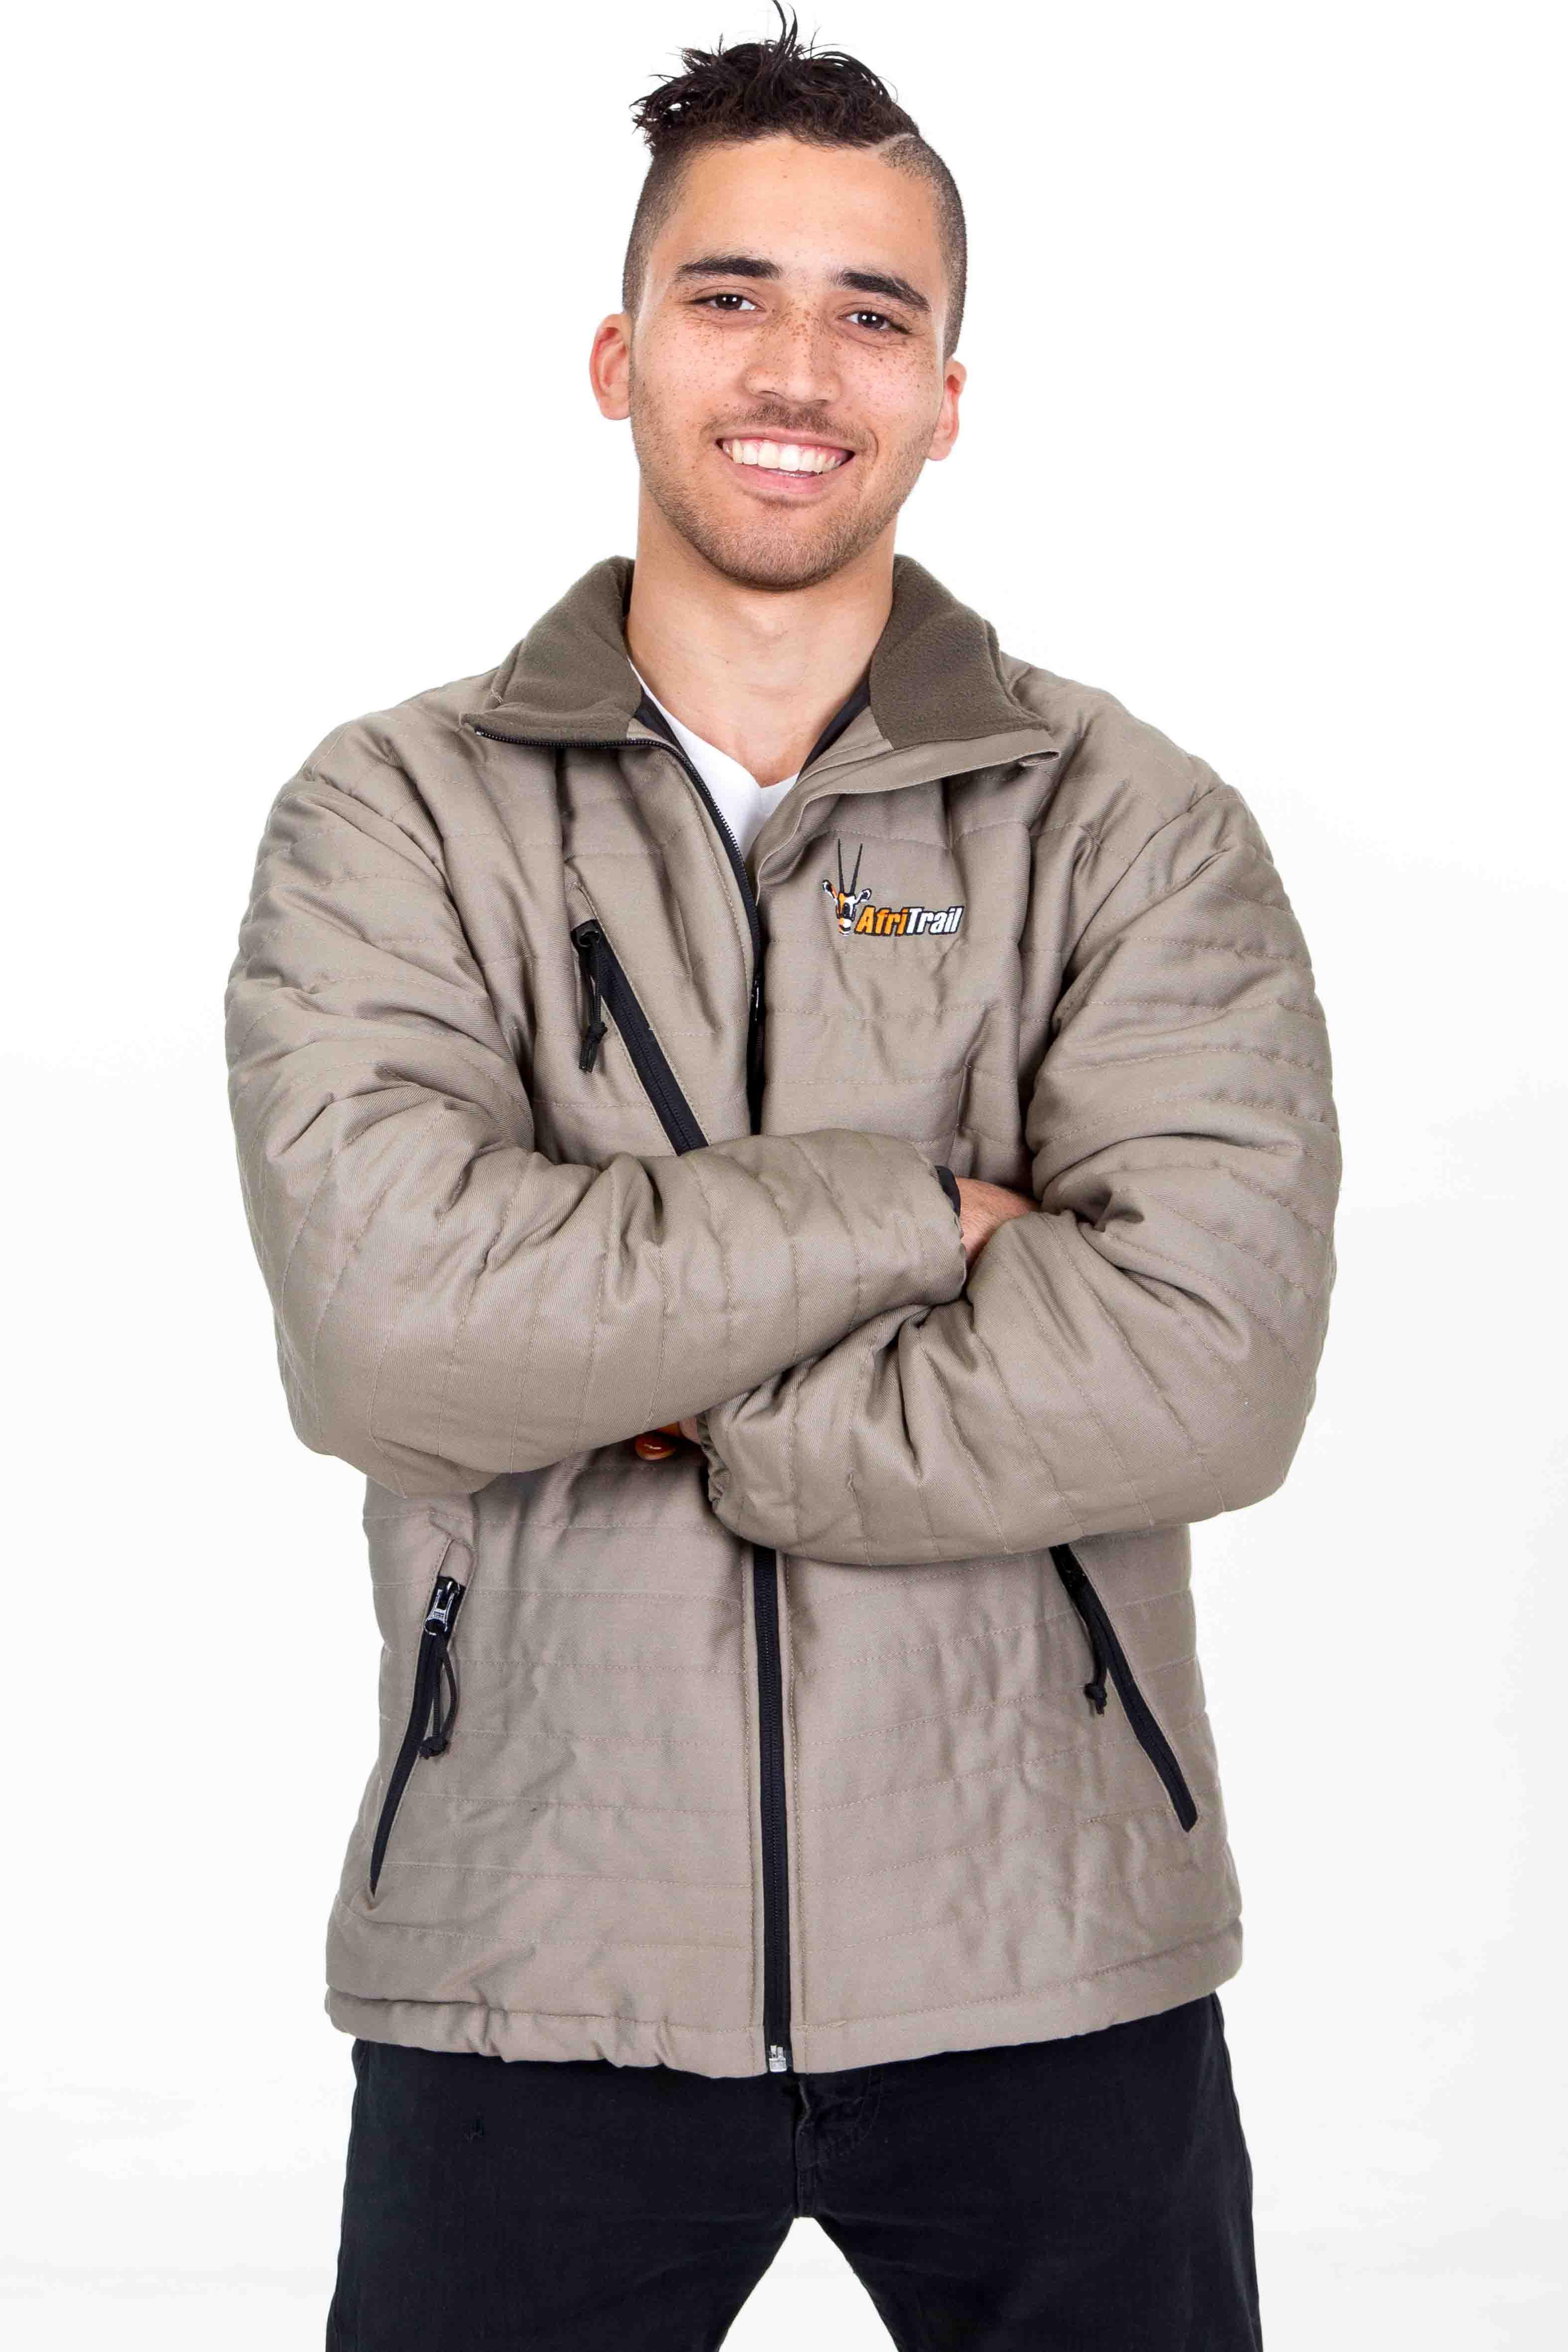 afritrail-pc-twill-men's-padded-jacket